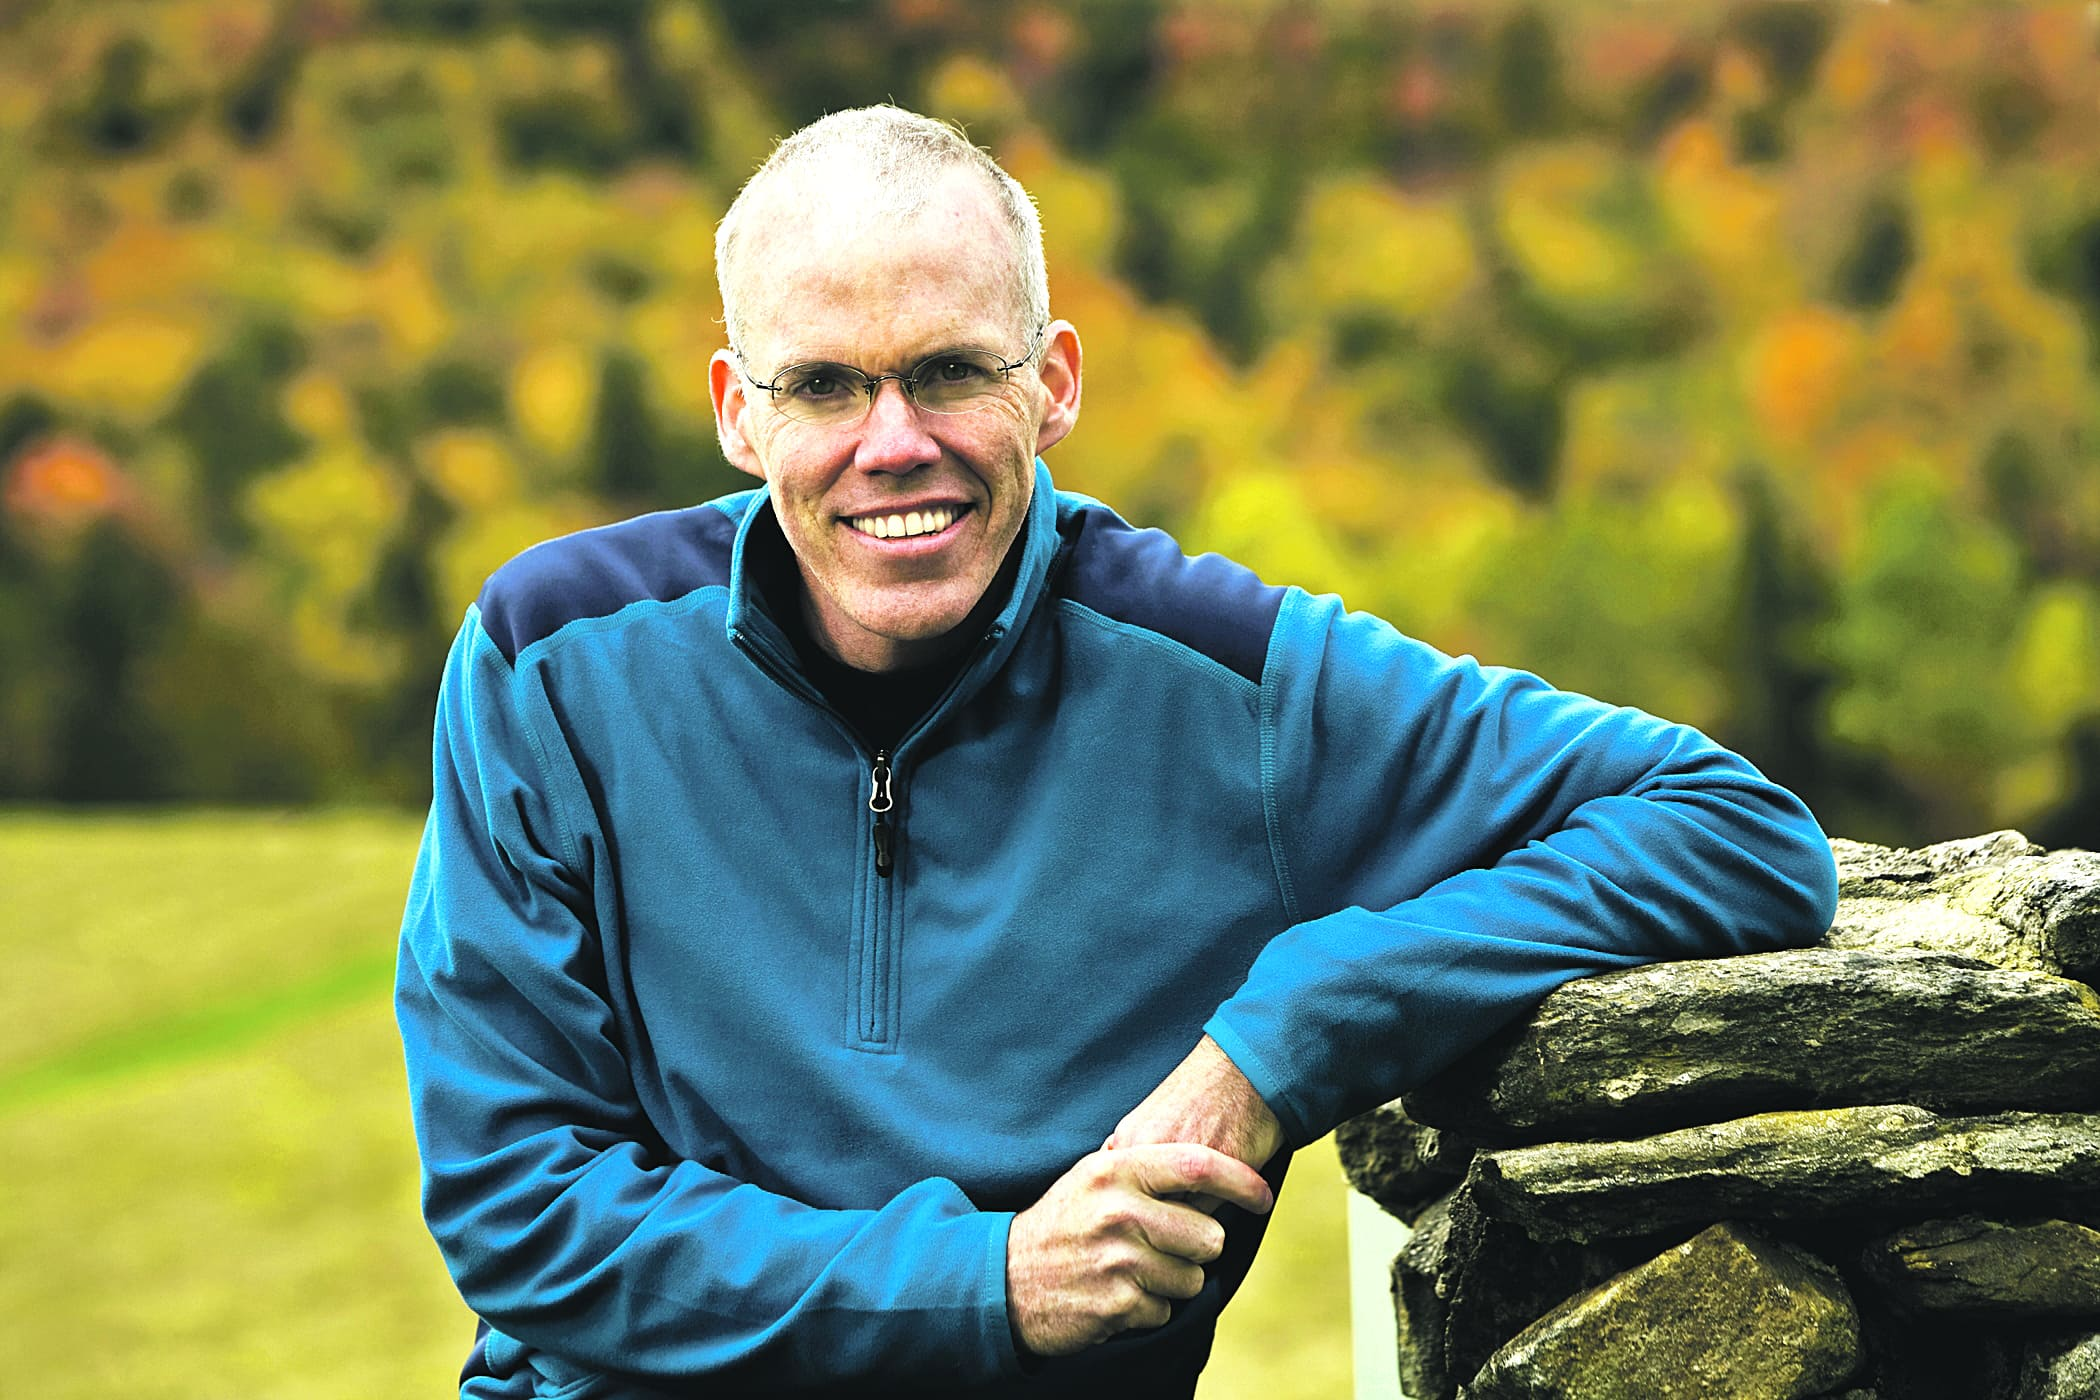 El activista Bill McKibben. | La Marea